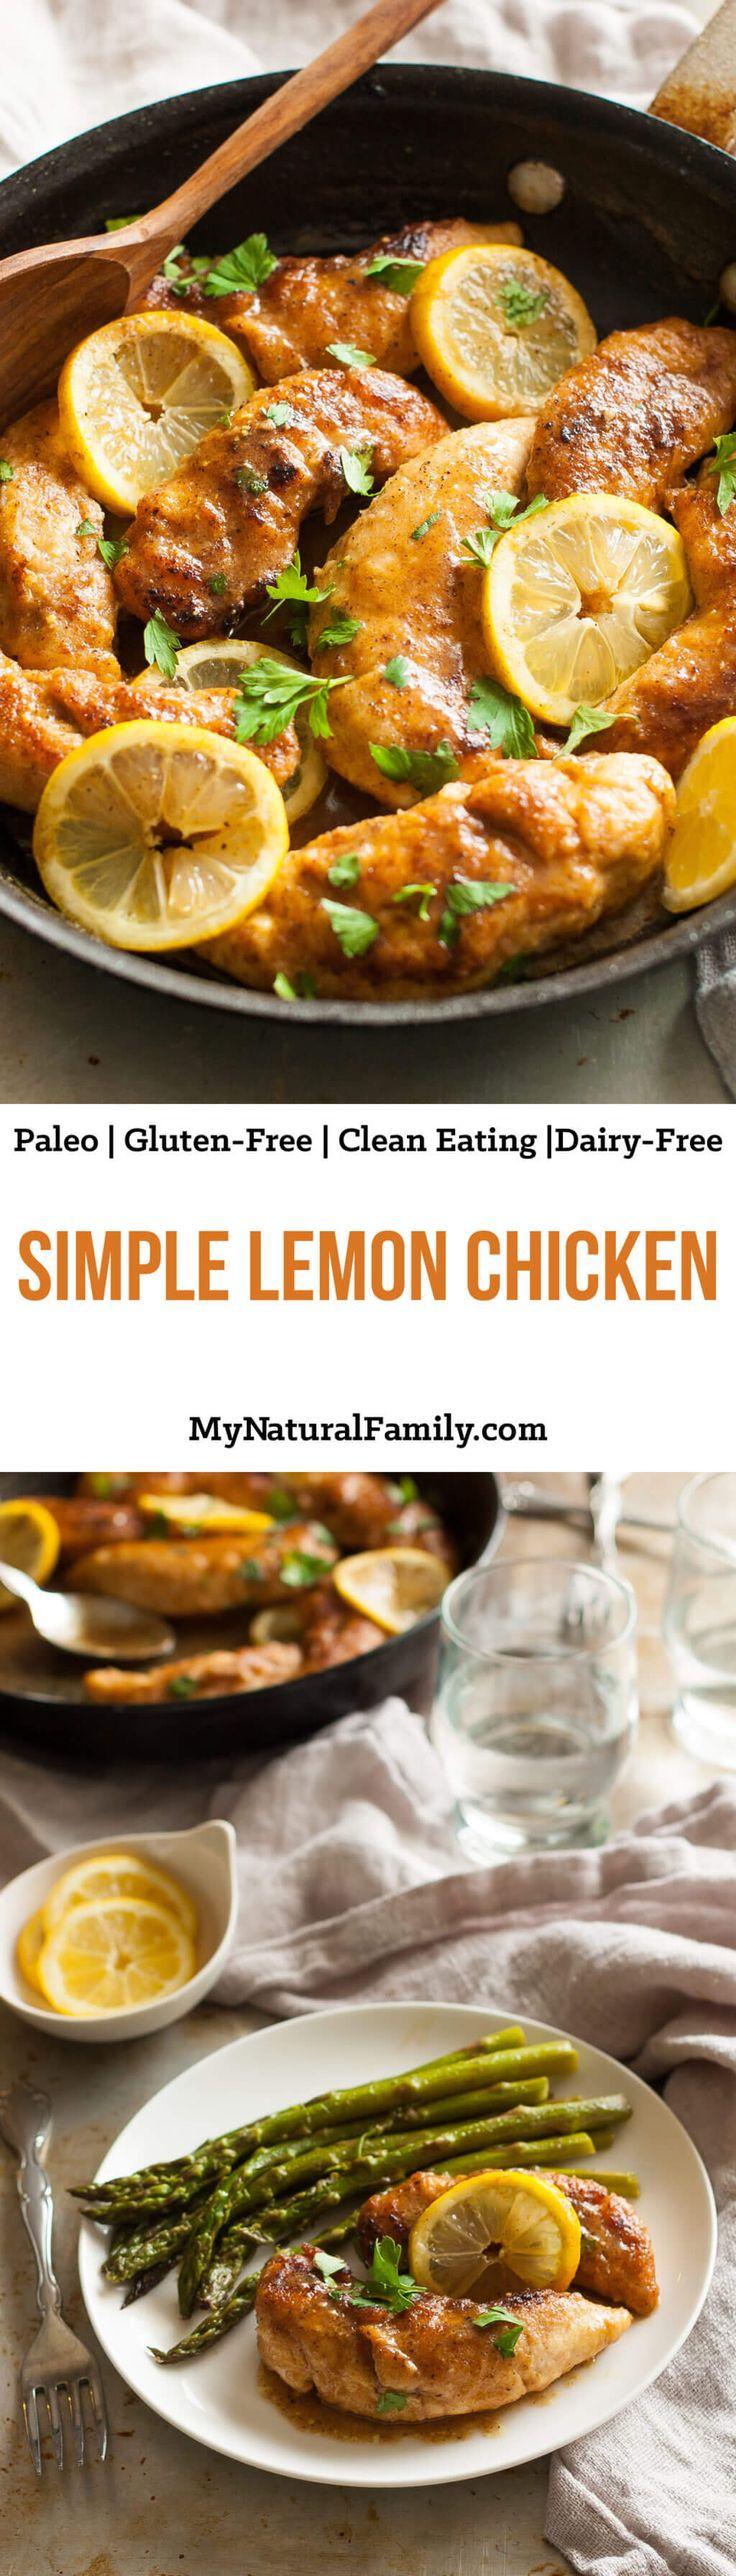 Clean Eating Simple Lemon Chicken Recipe {Paleo, Gluten-Free, Clean Eating, Dairy-Free}